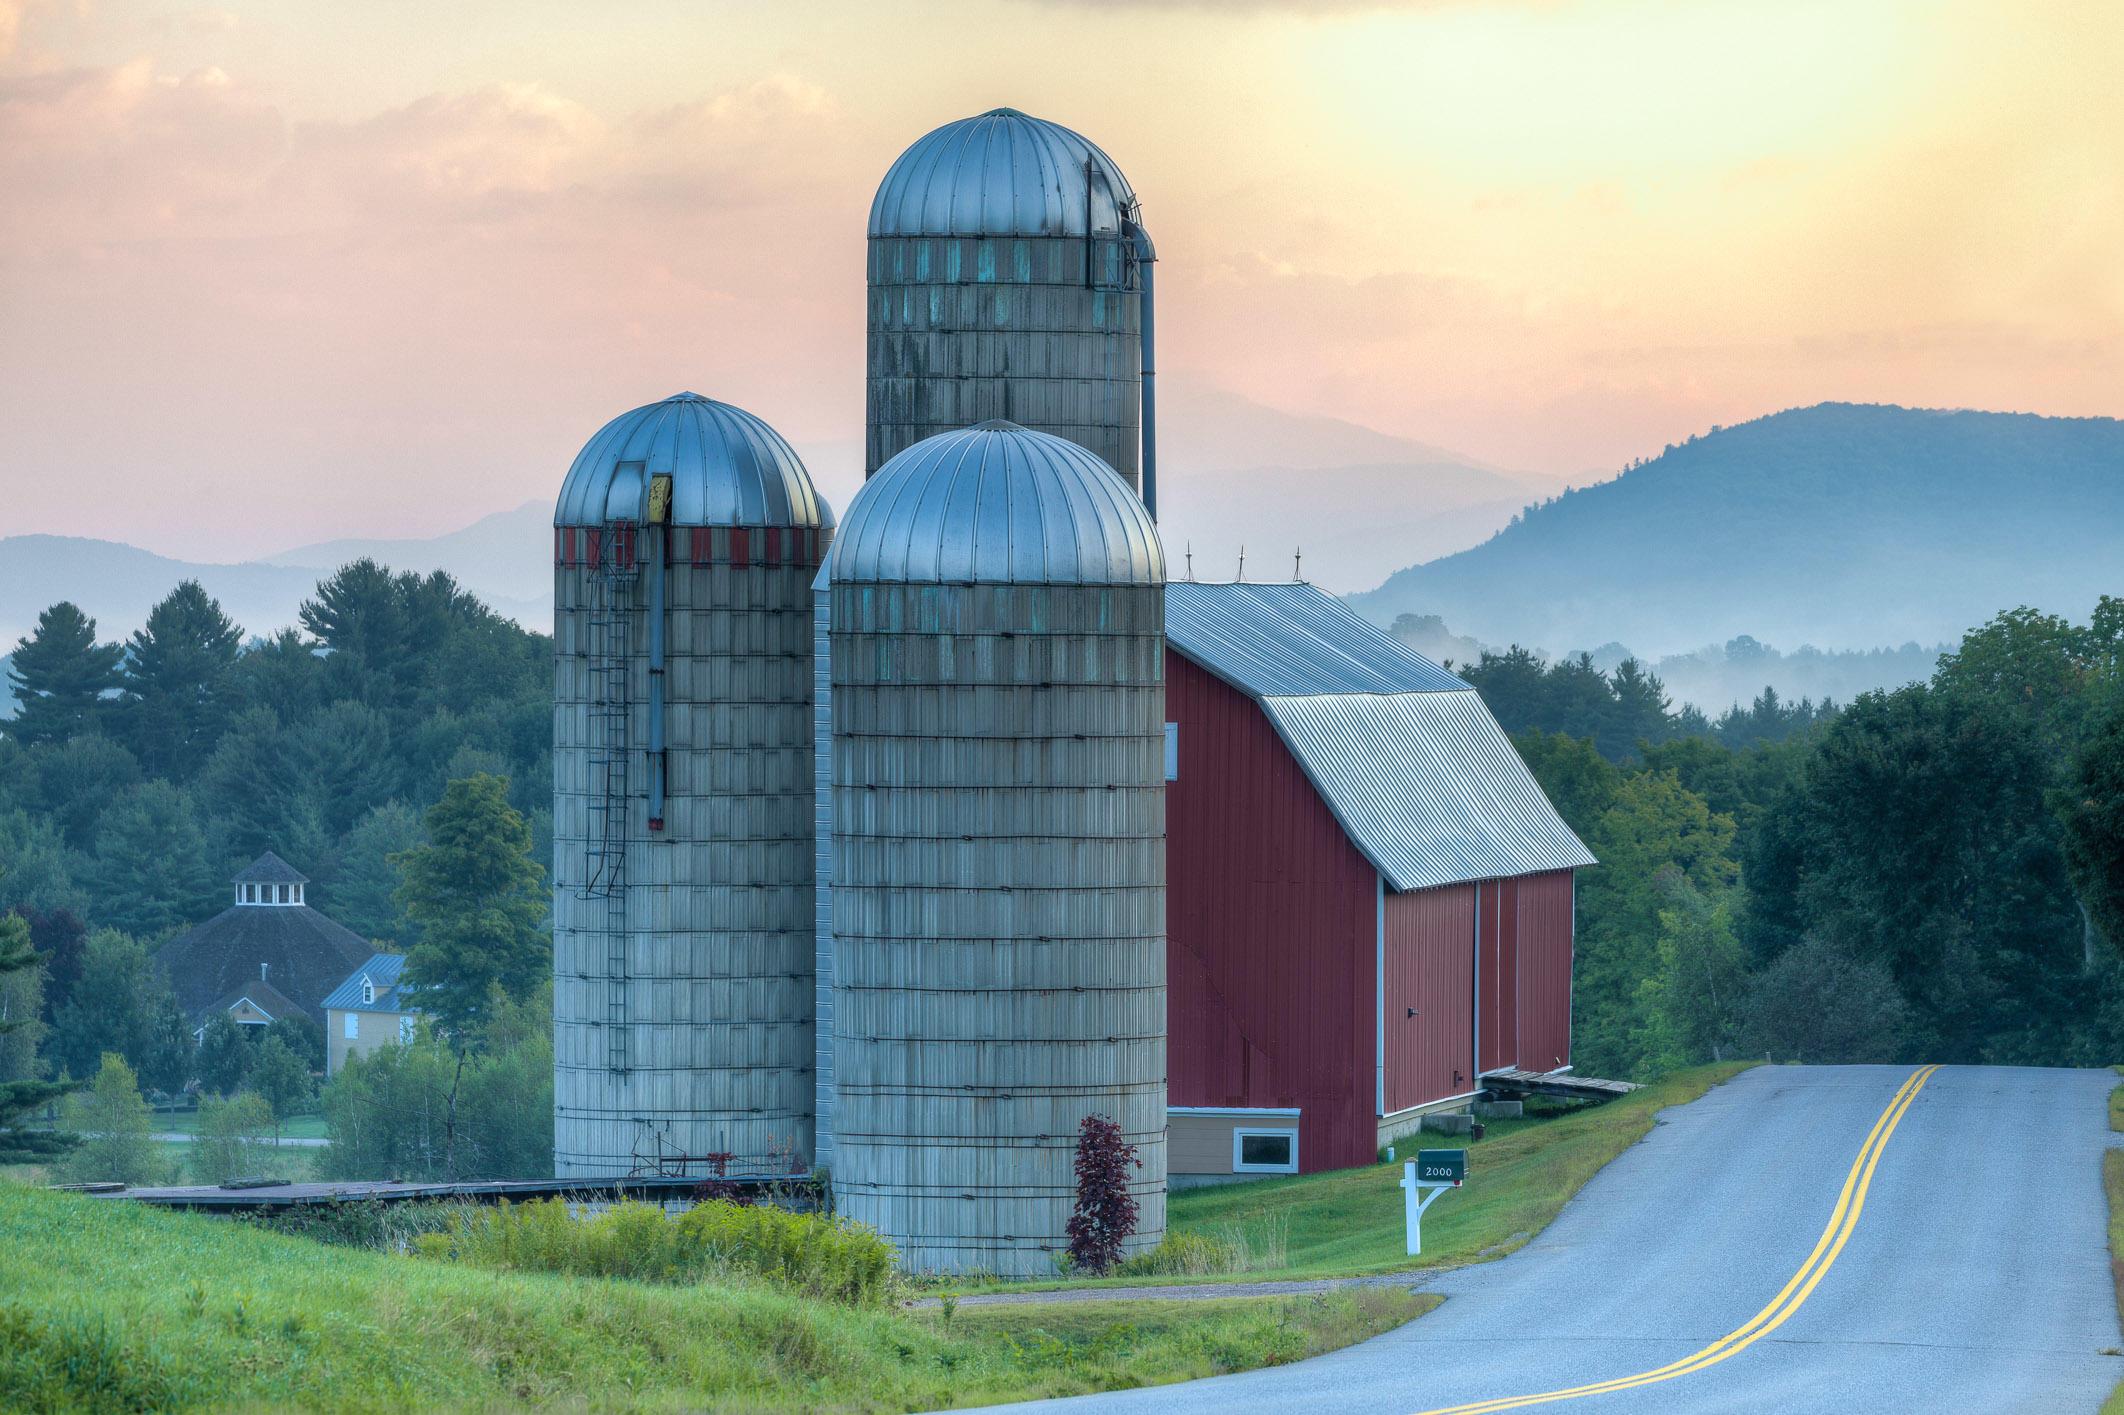 Barn at Sunrise, Waitsfield, Vermont